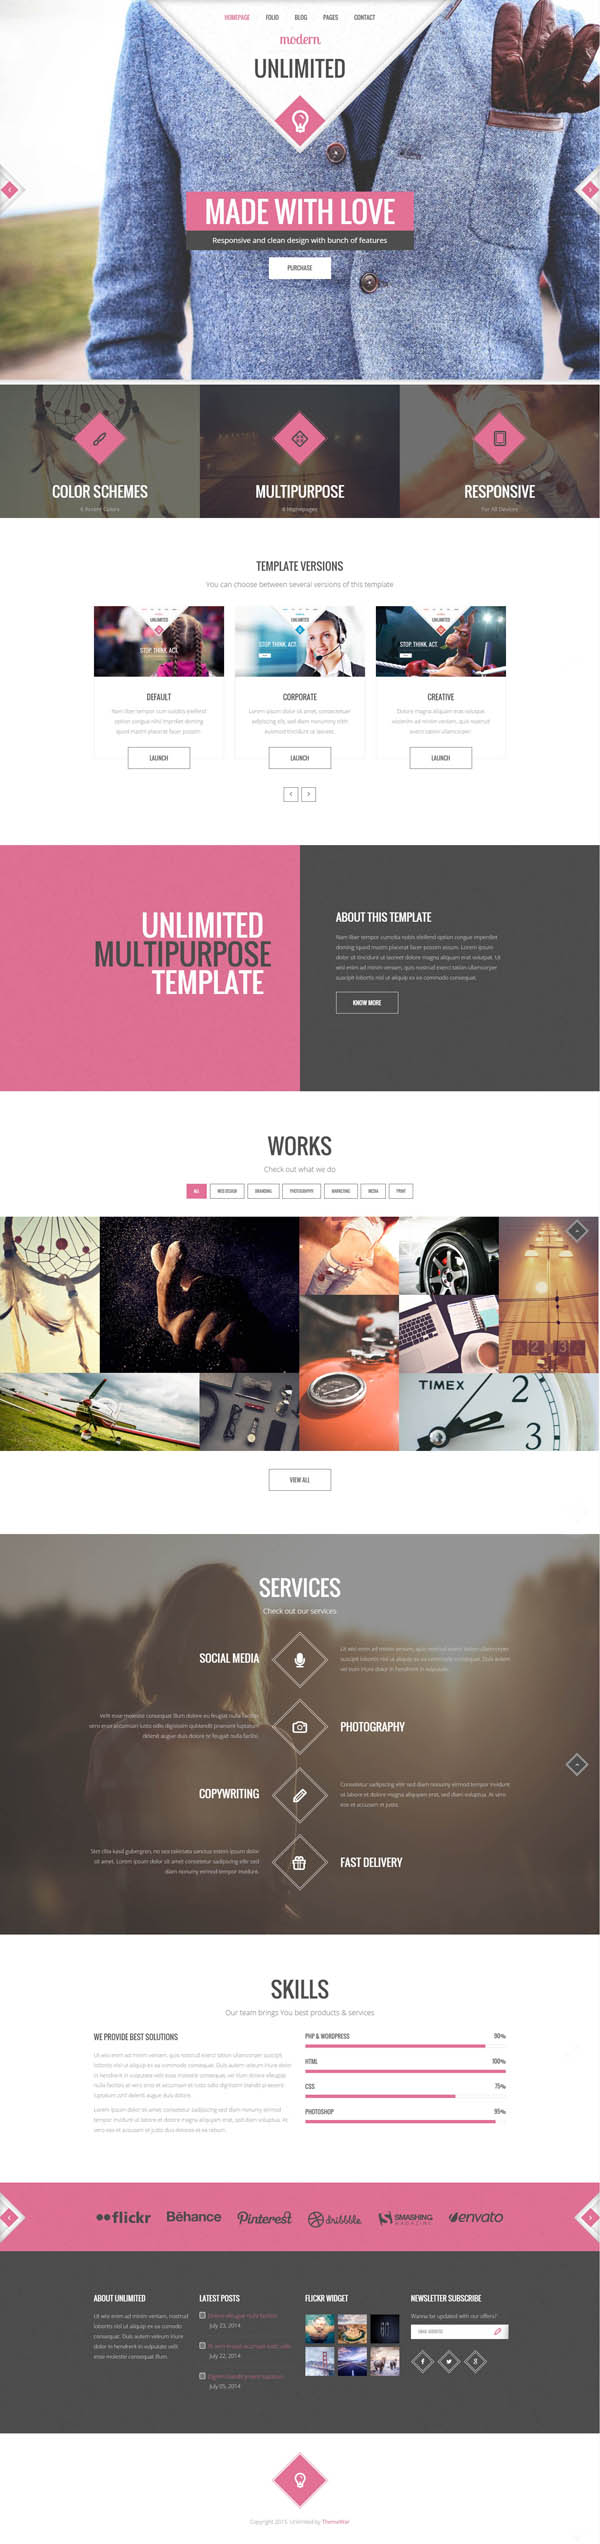 Unlimited - Responsive Multipurpose HTML5 Template